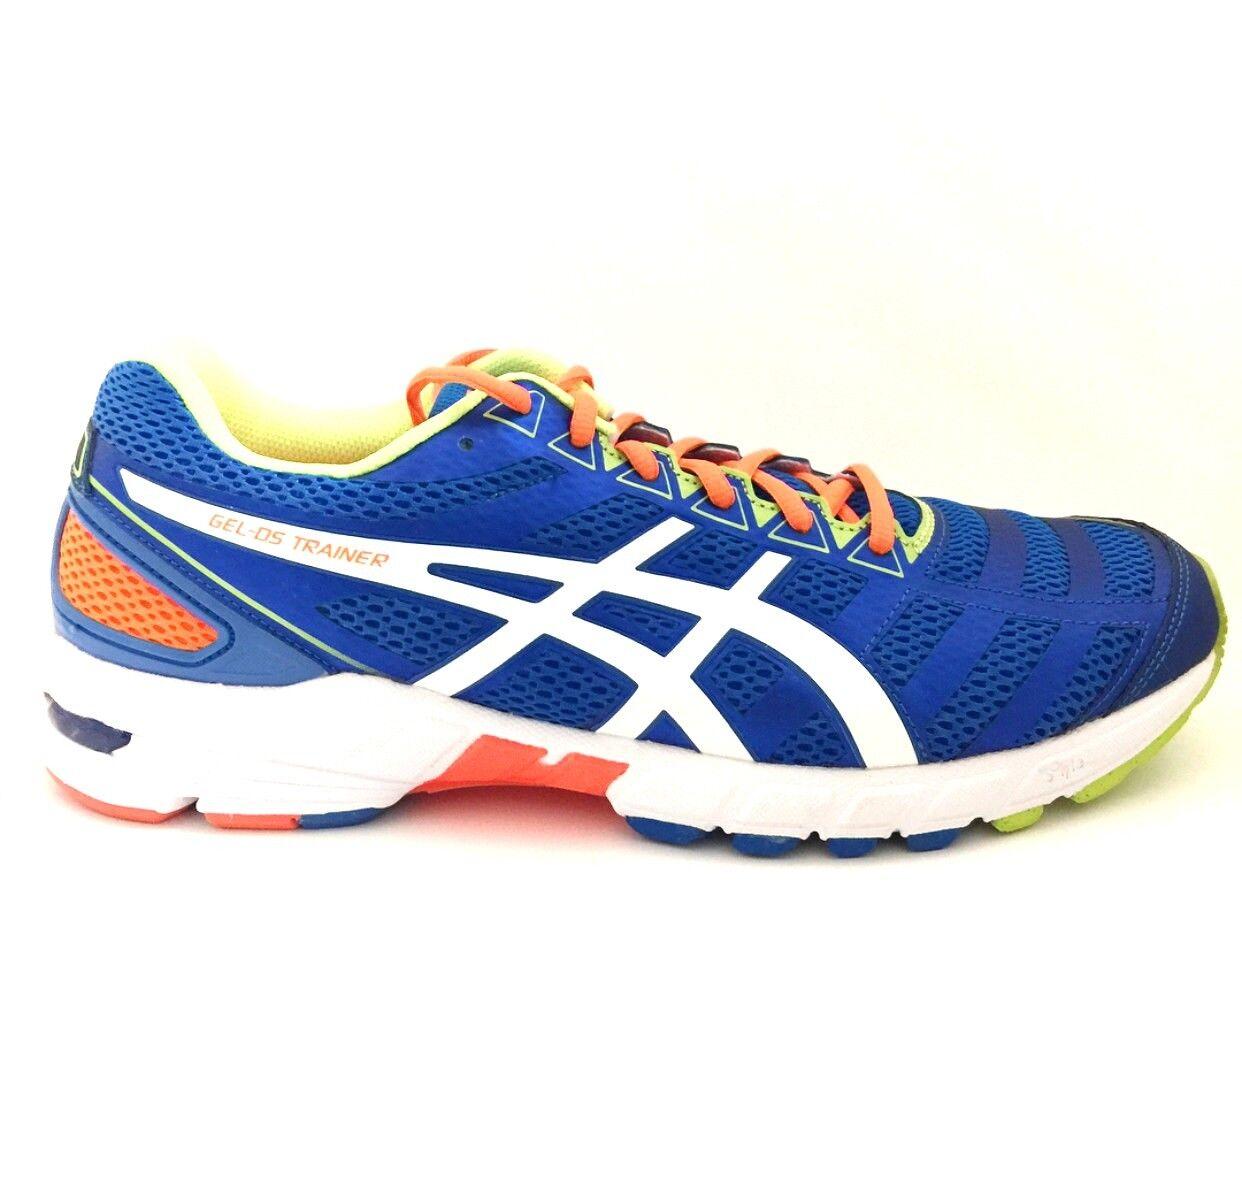 SUPER SPECIAL   Asics Gel DS Trainer 18 Mens Running shoes (D) (4201)